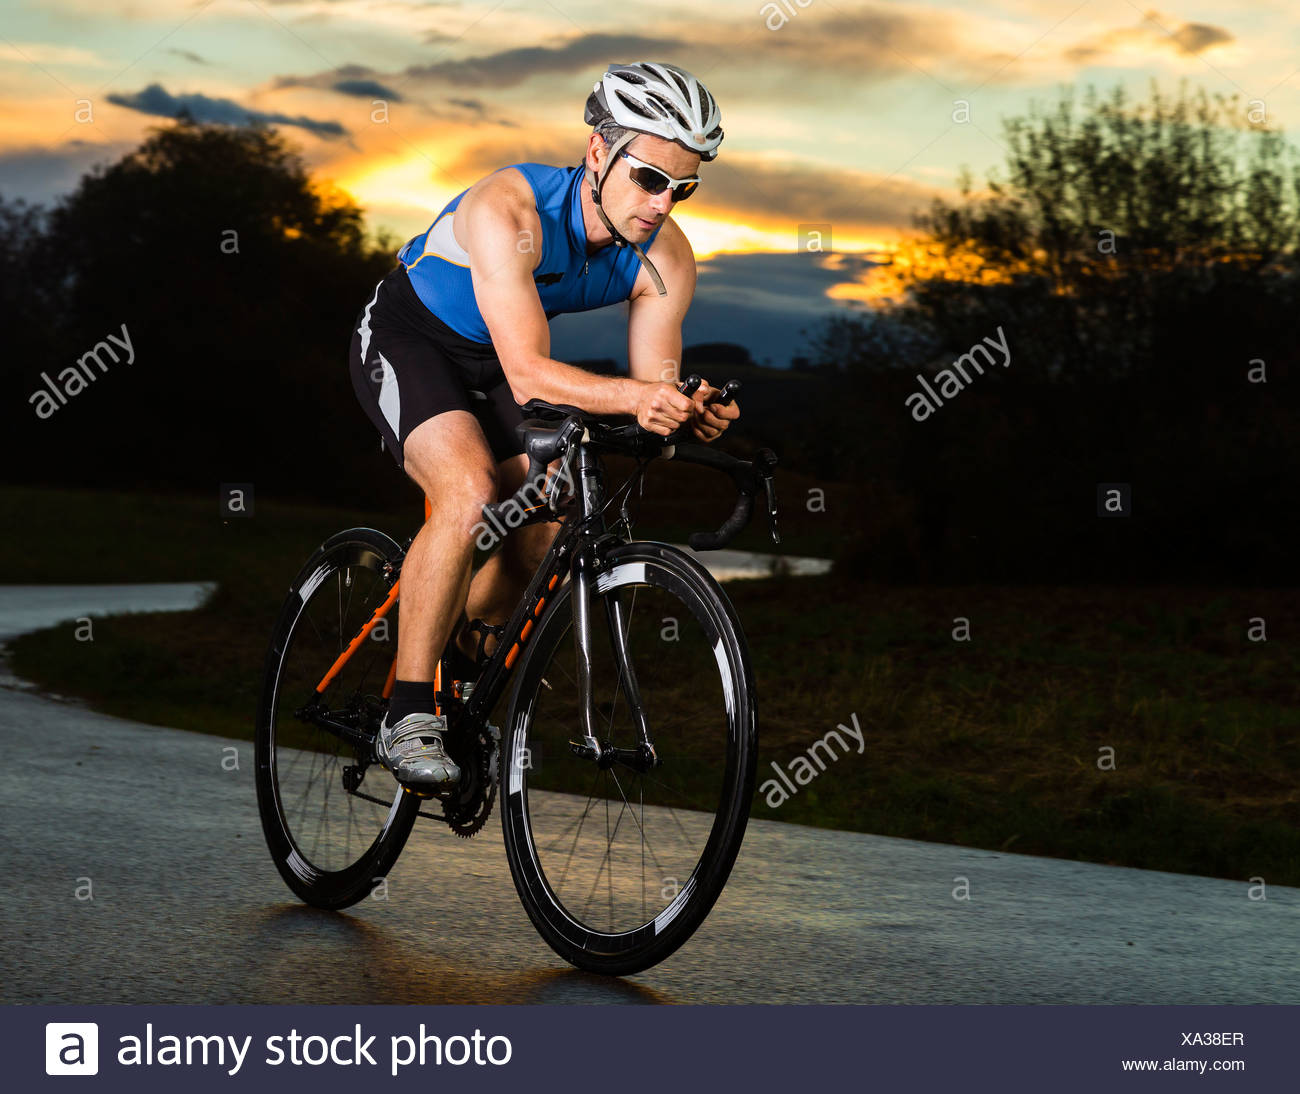 Germany, triathlete riding bicycle - Stock Image